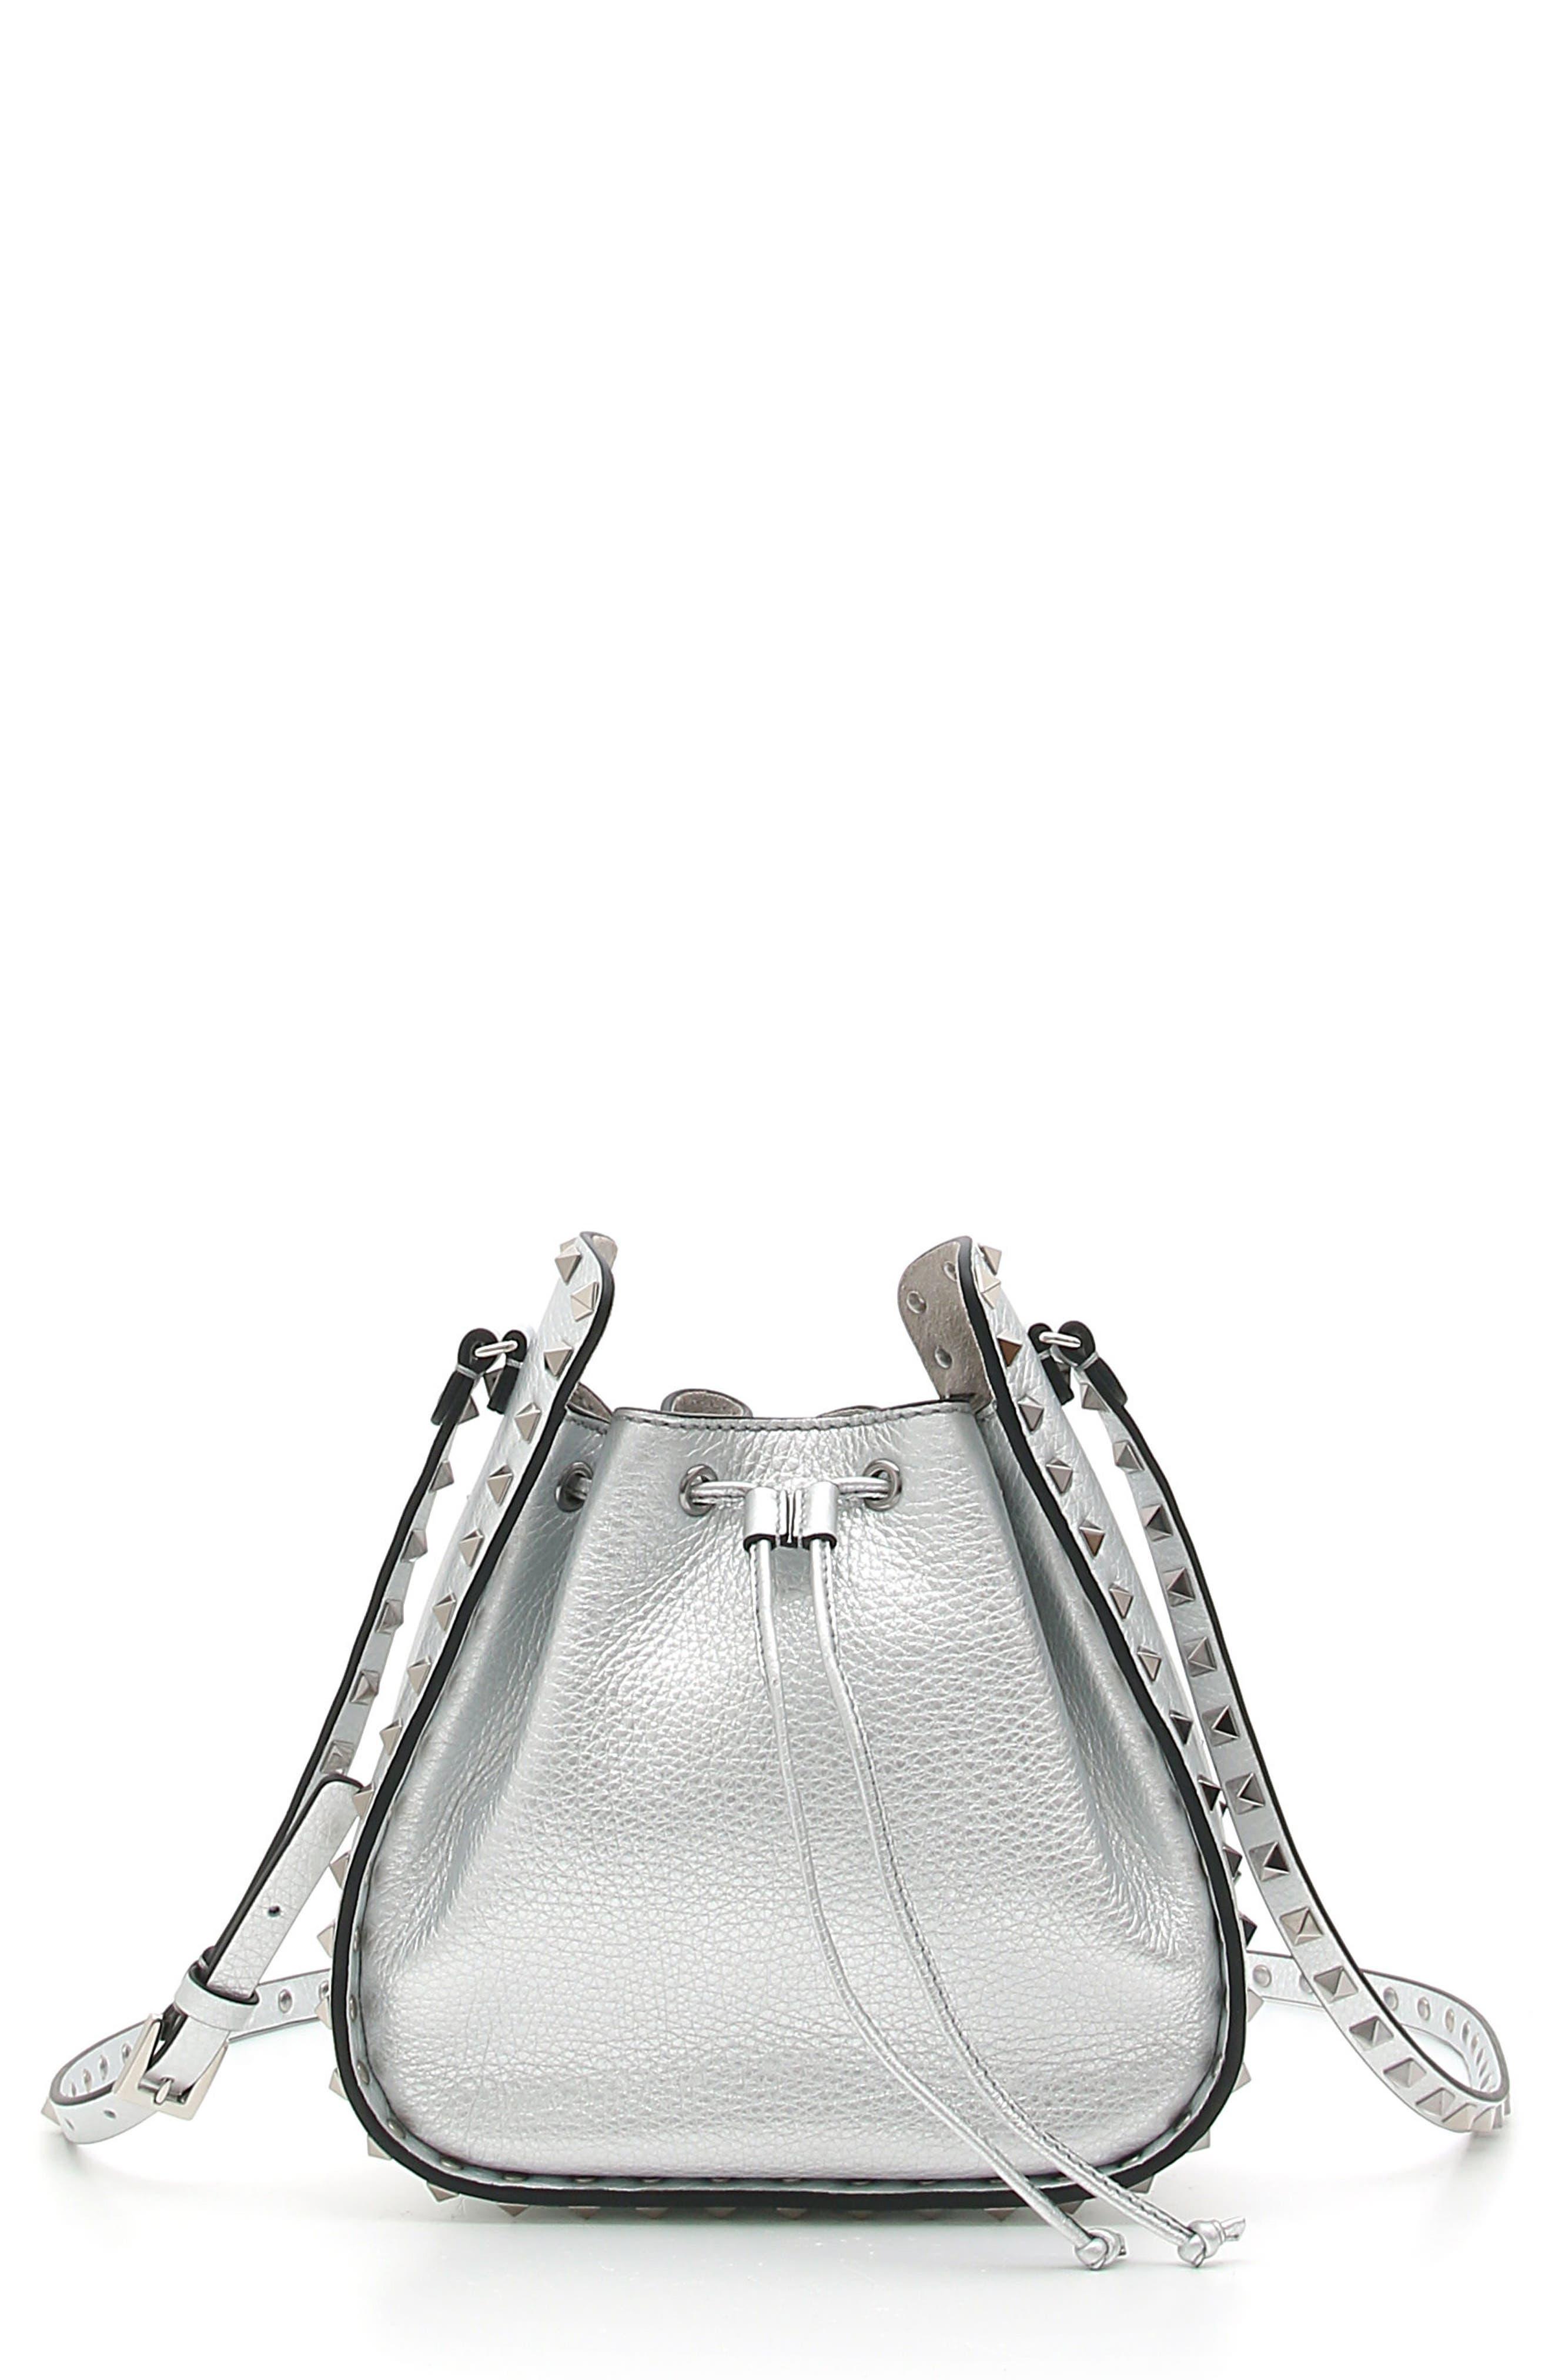 Rockstud Metallic Leather Bucket Bag,                             Main thumbnail 1, color,                             040